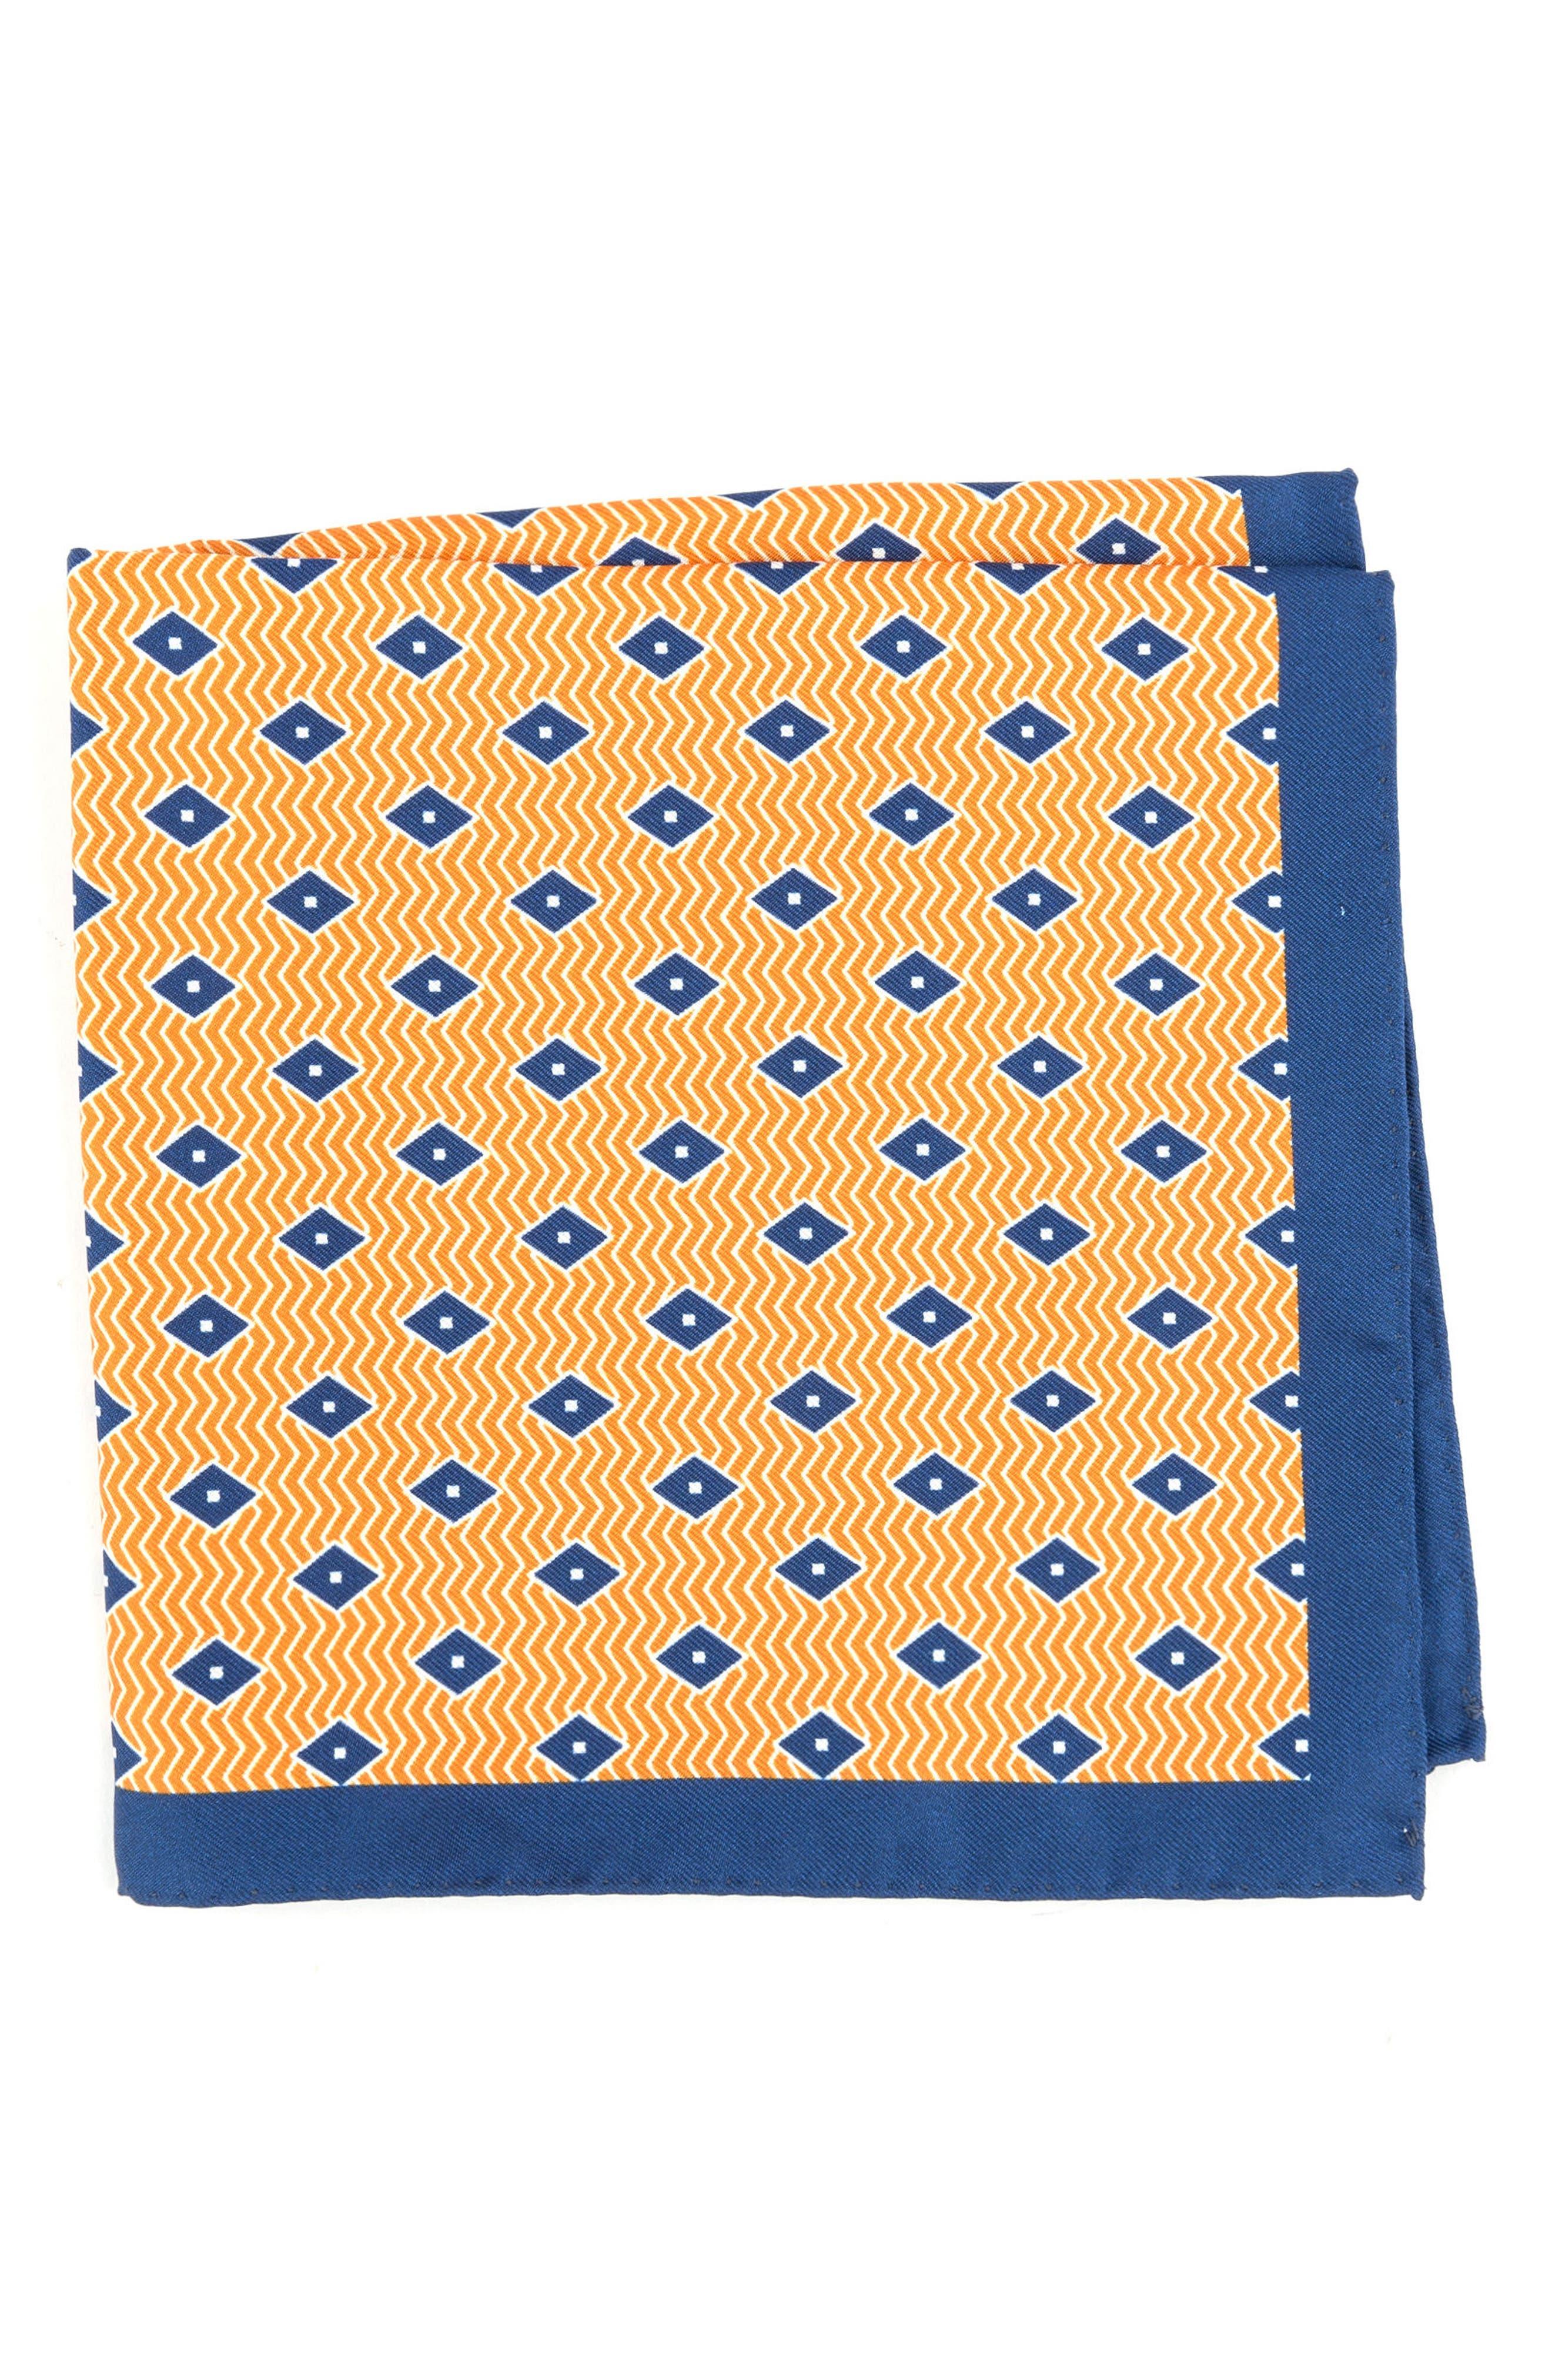 Diamond Silk Pocket Square,                         Main,                         color, Orange